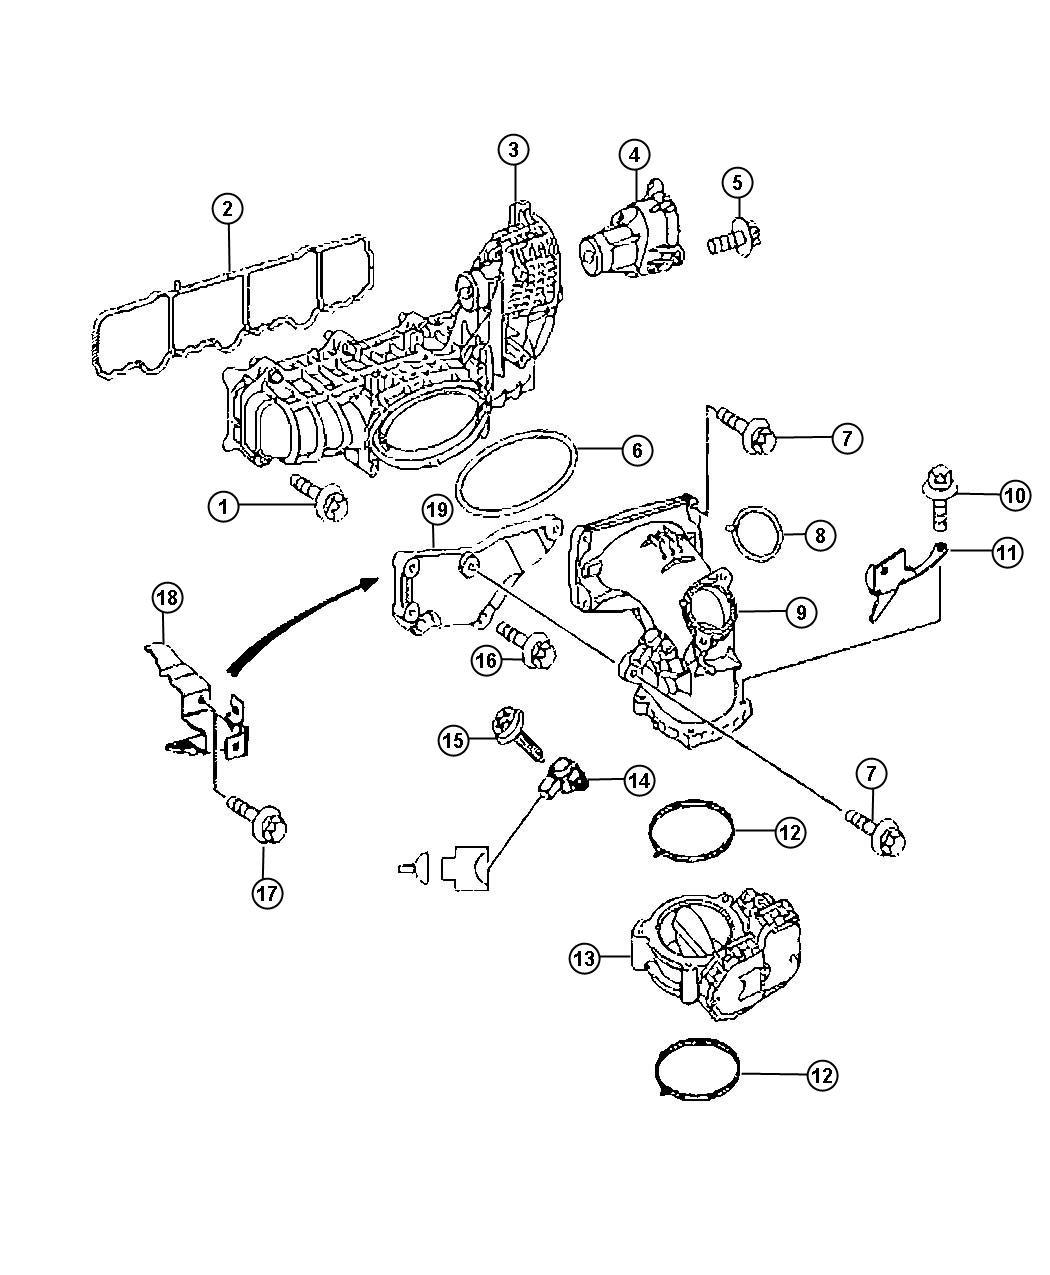 Intake Manifold 2 2lsel 2 2l 4 Cyl Turbosel Engine